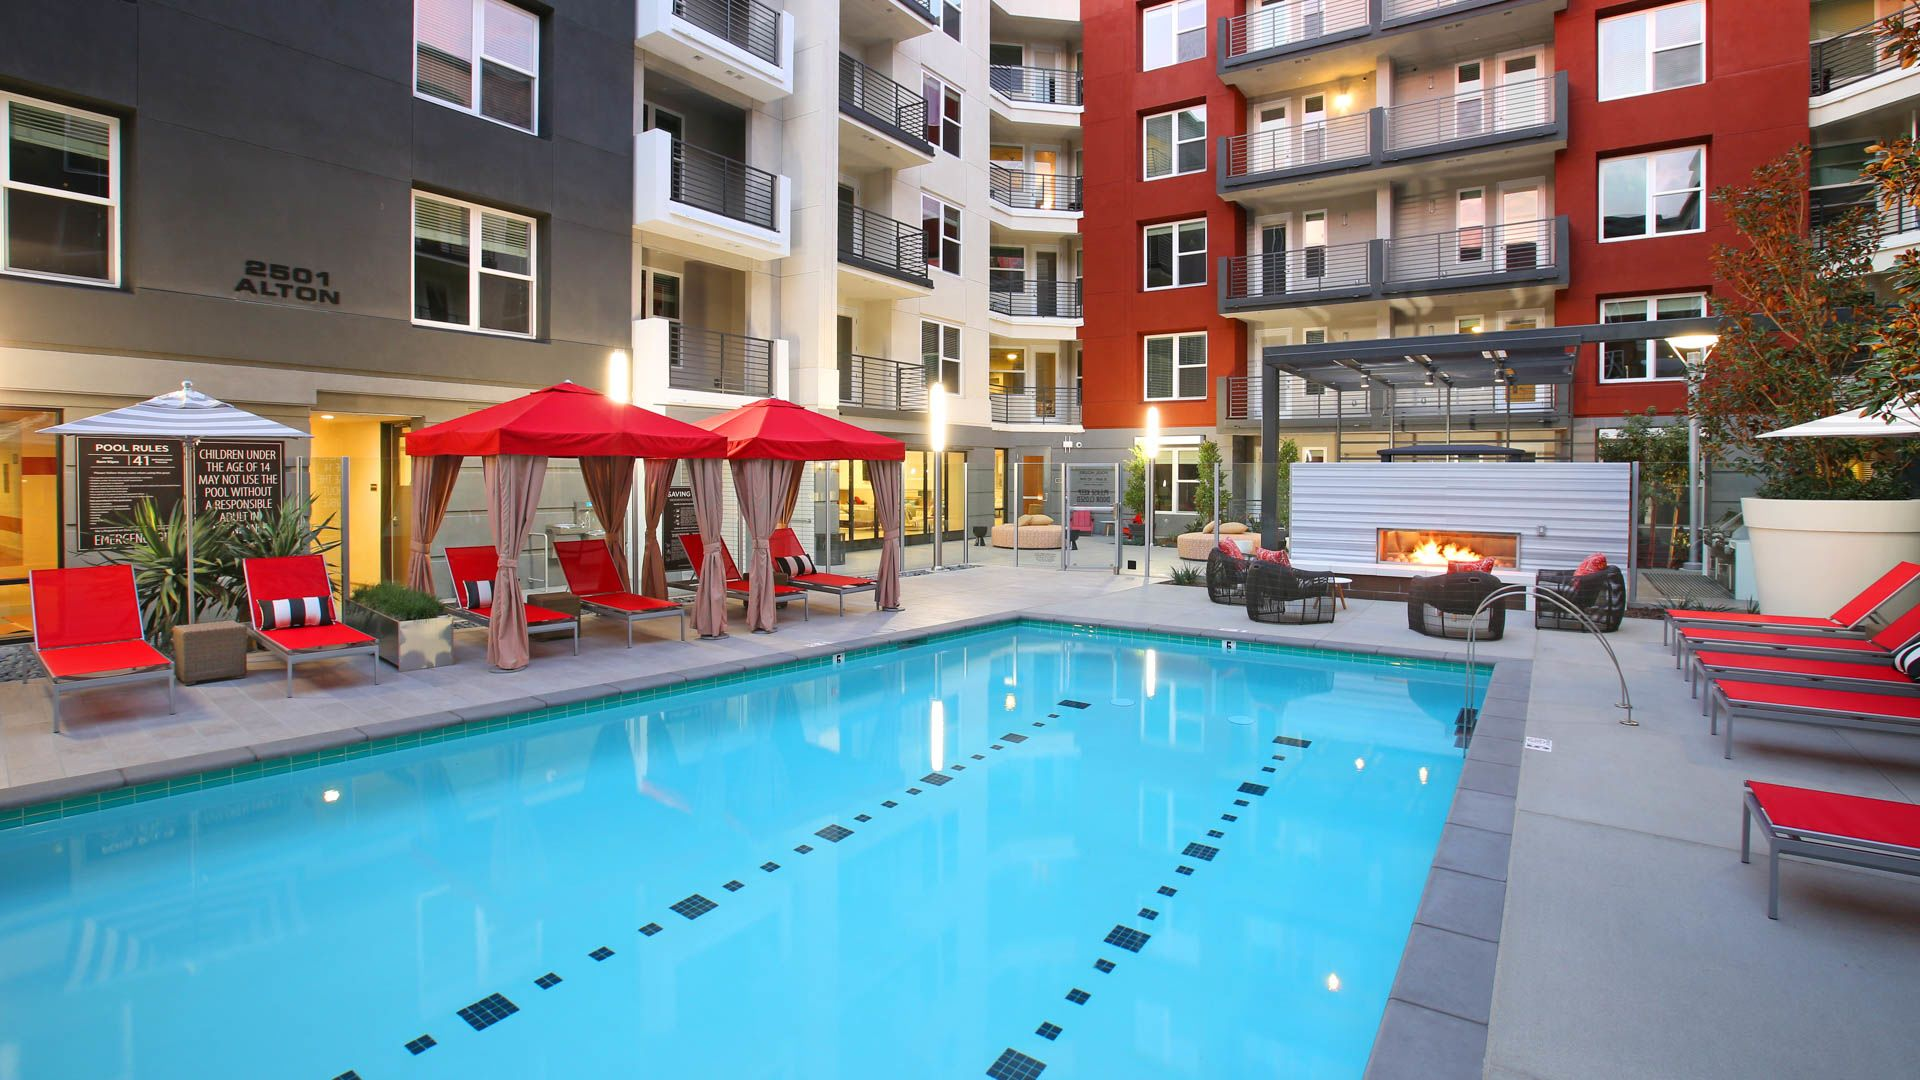 The alton apartments irvine business corridor 2501 alton parkway for Alton swimming pool opening times